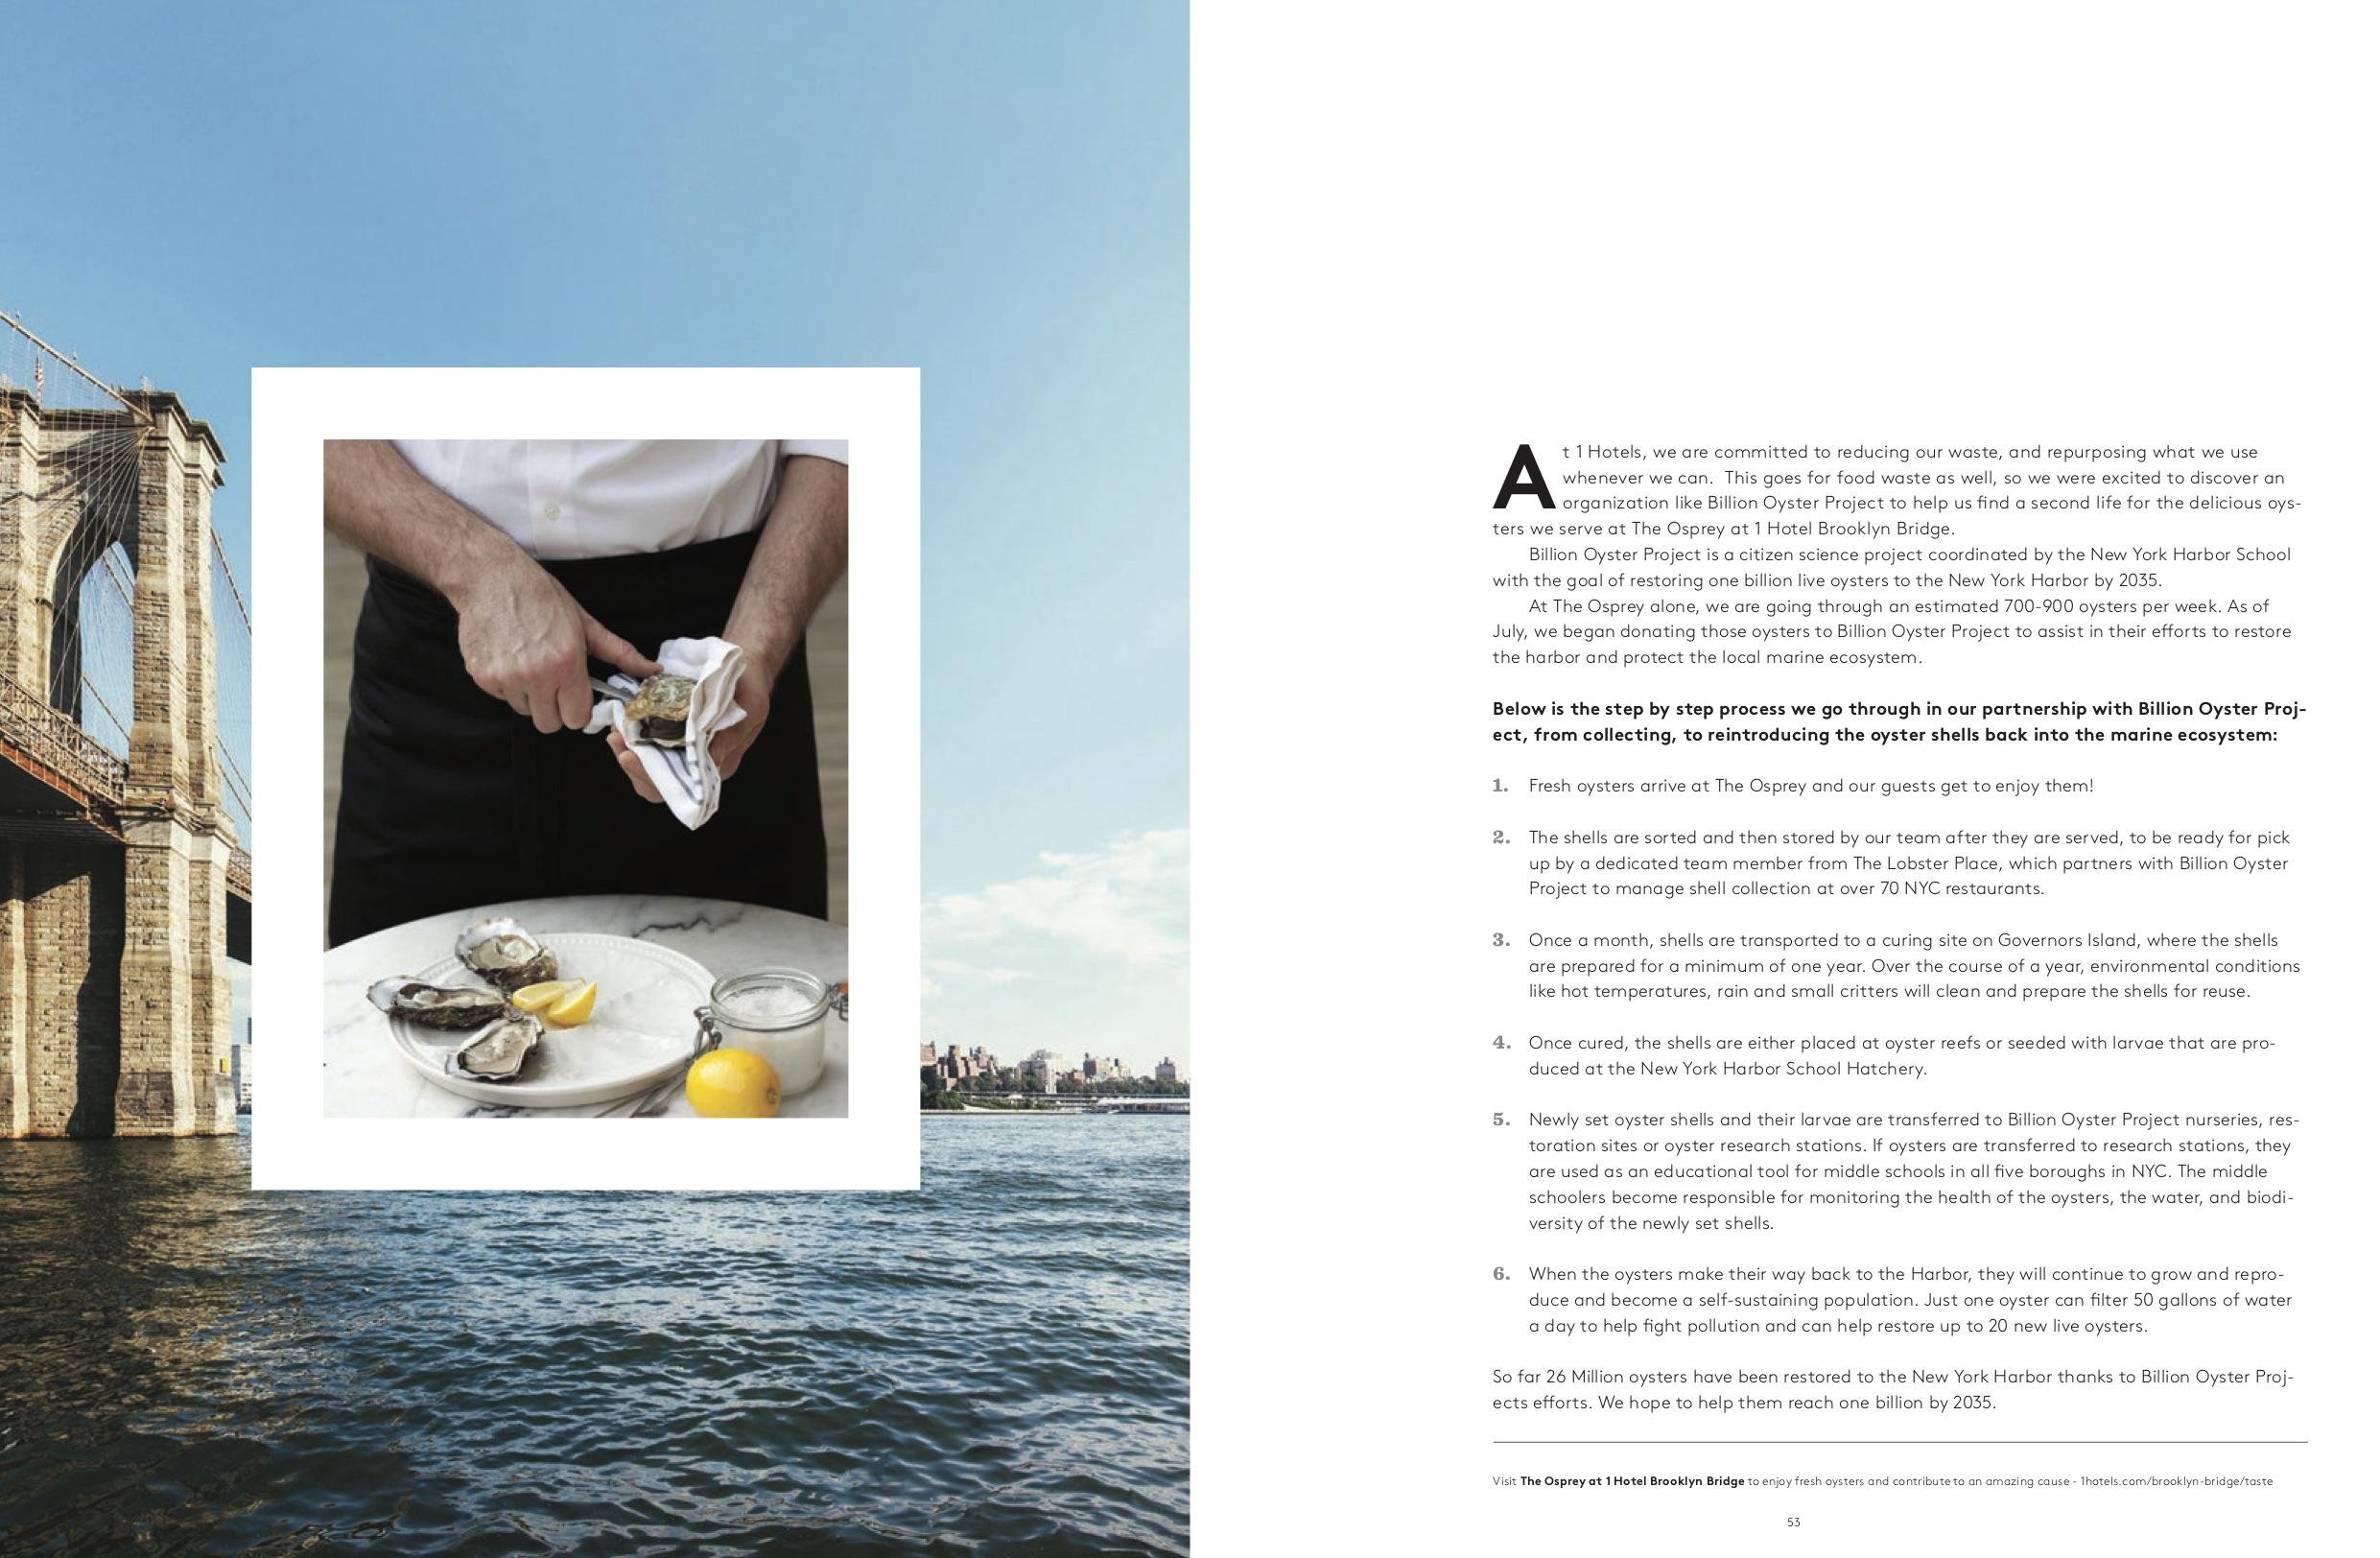 1 Hotel Magazine Preview v16 28.jpg